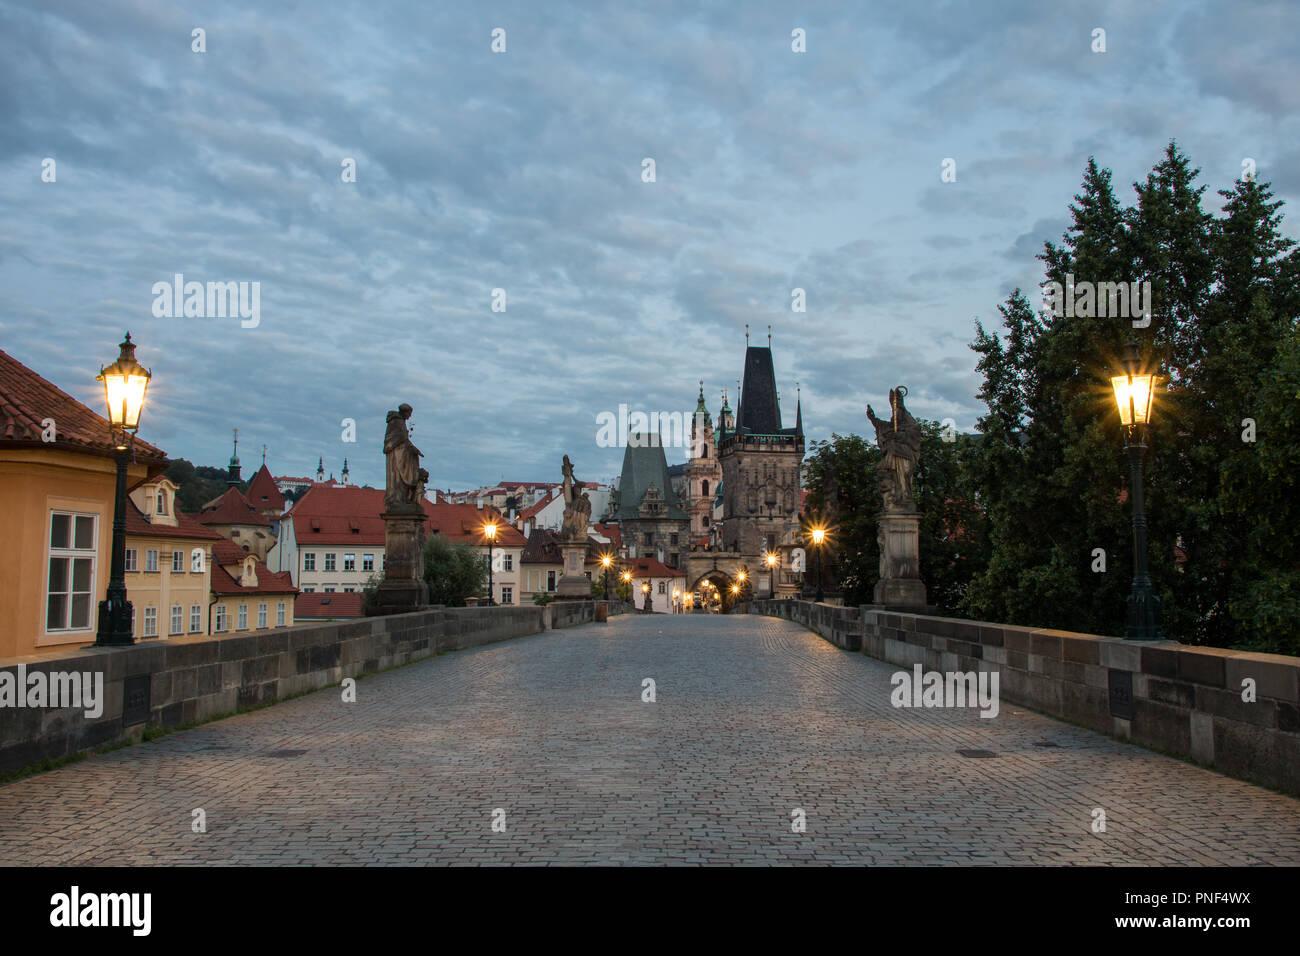 Morning on Charles Bridge in Prague, Czech Republic - Stock Image